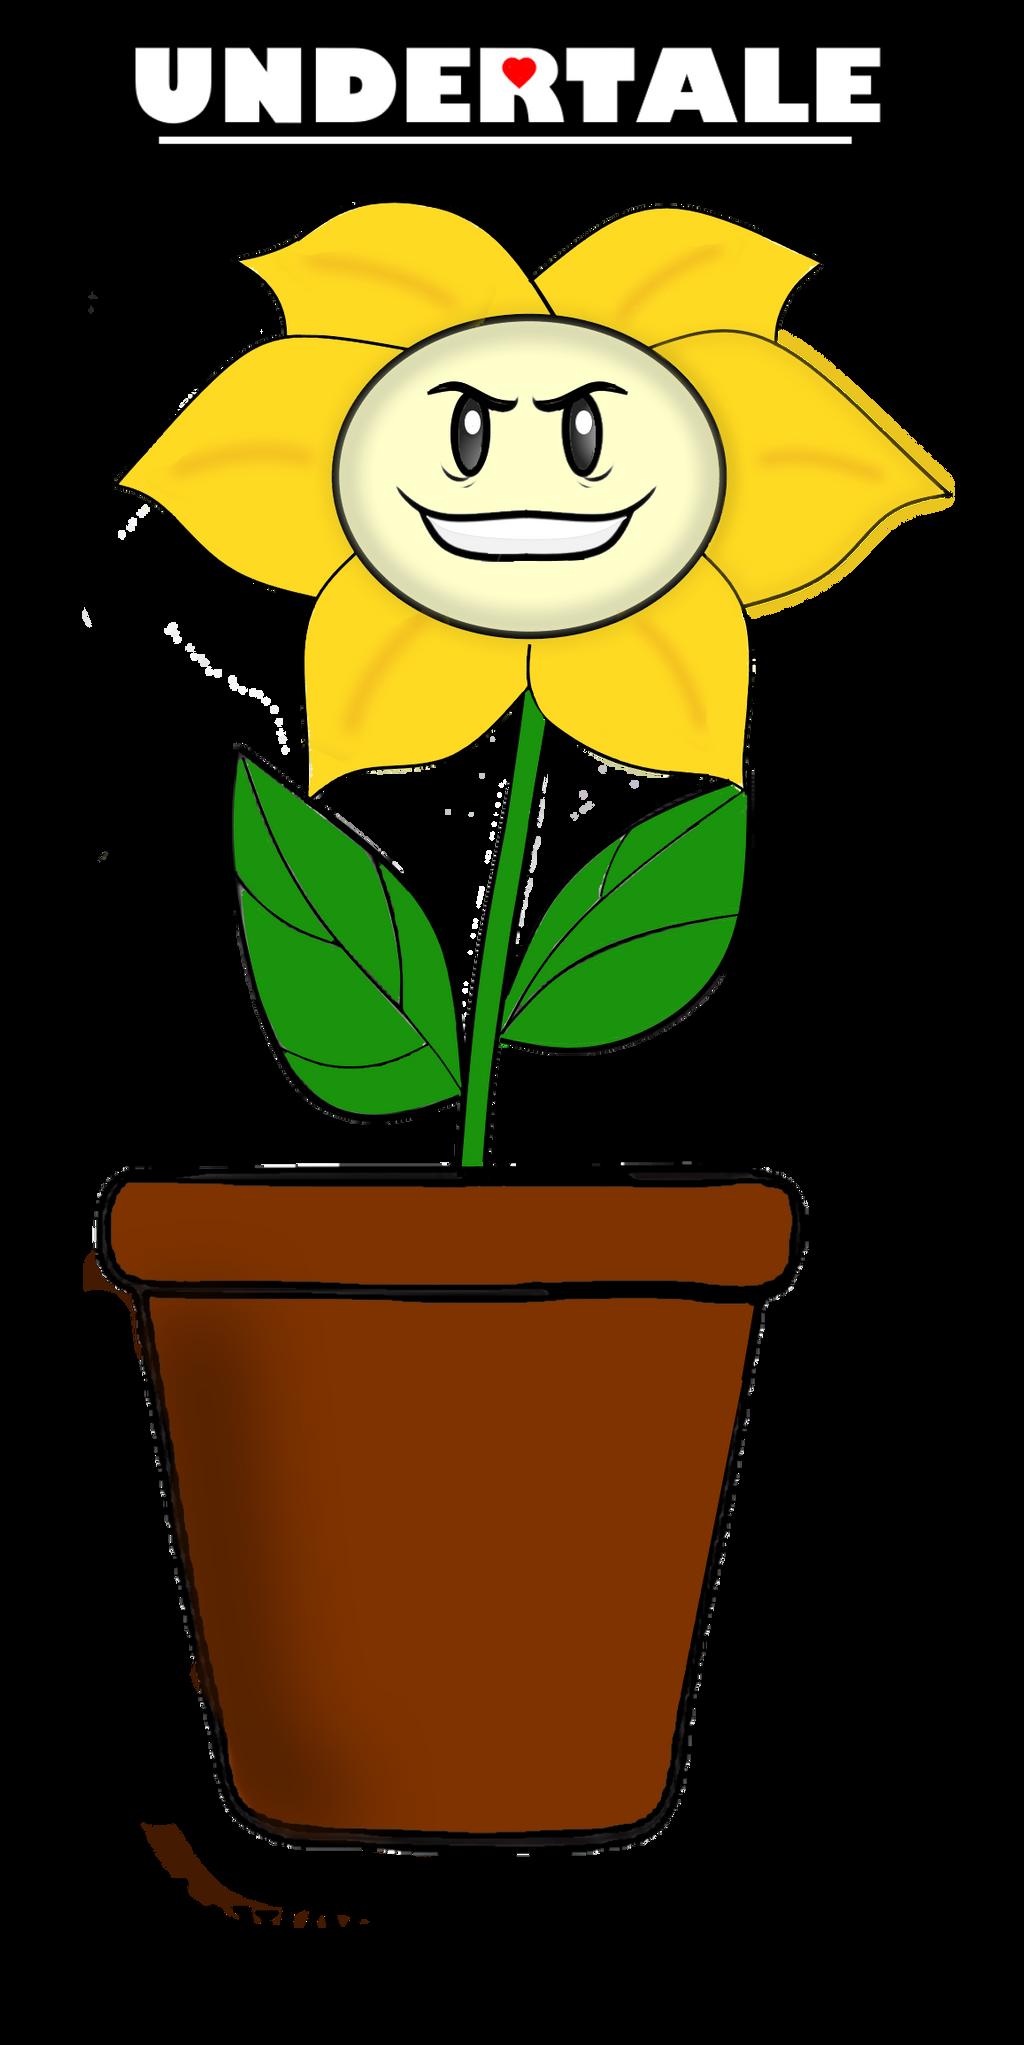 Undertale Flowey the Flower by fORCEMATION on DeviantArt